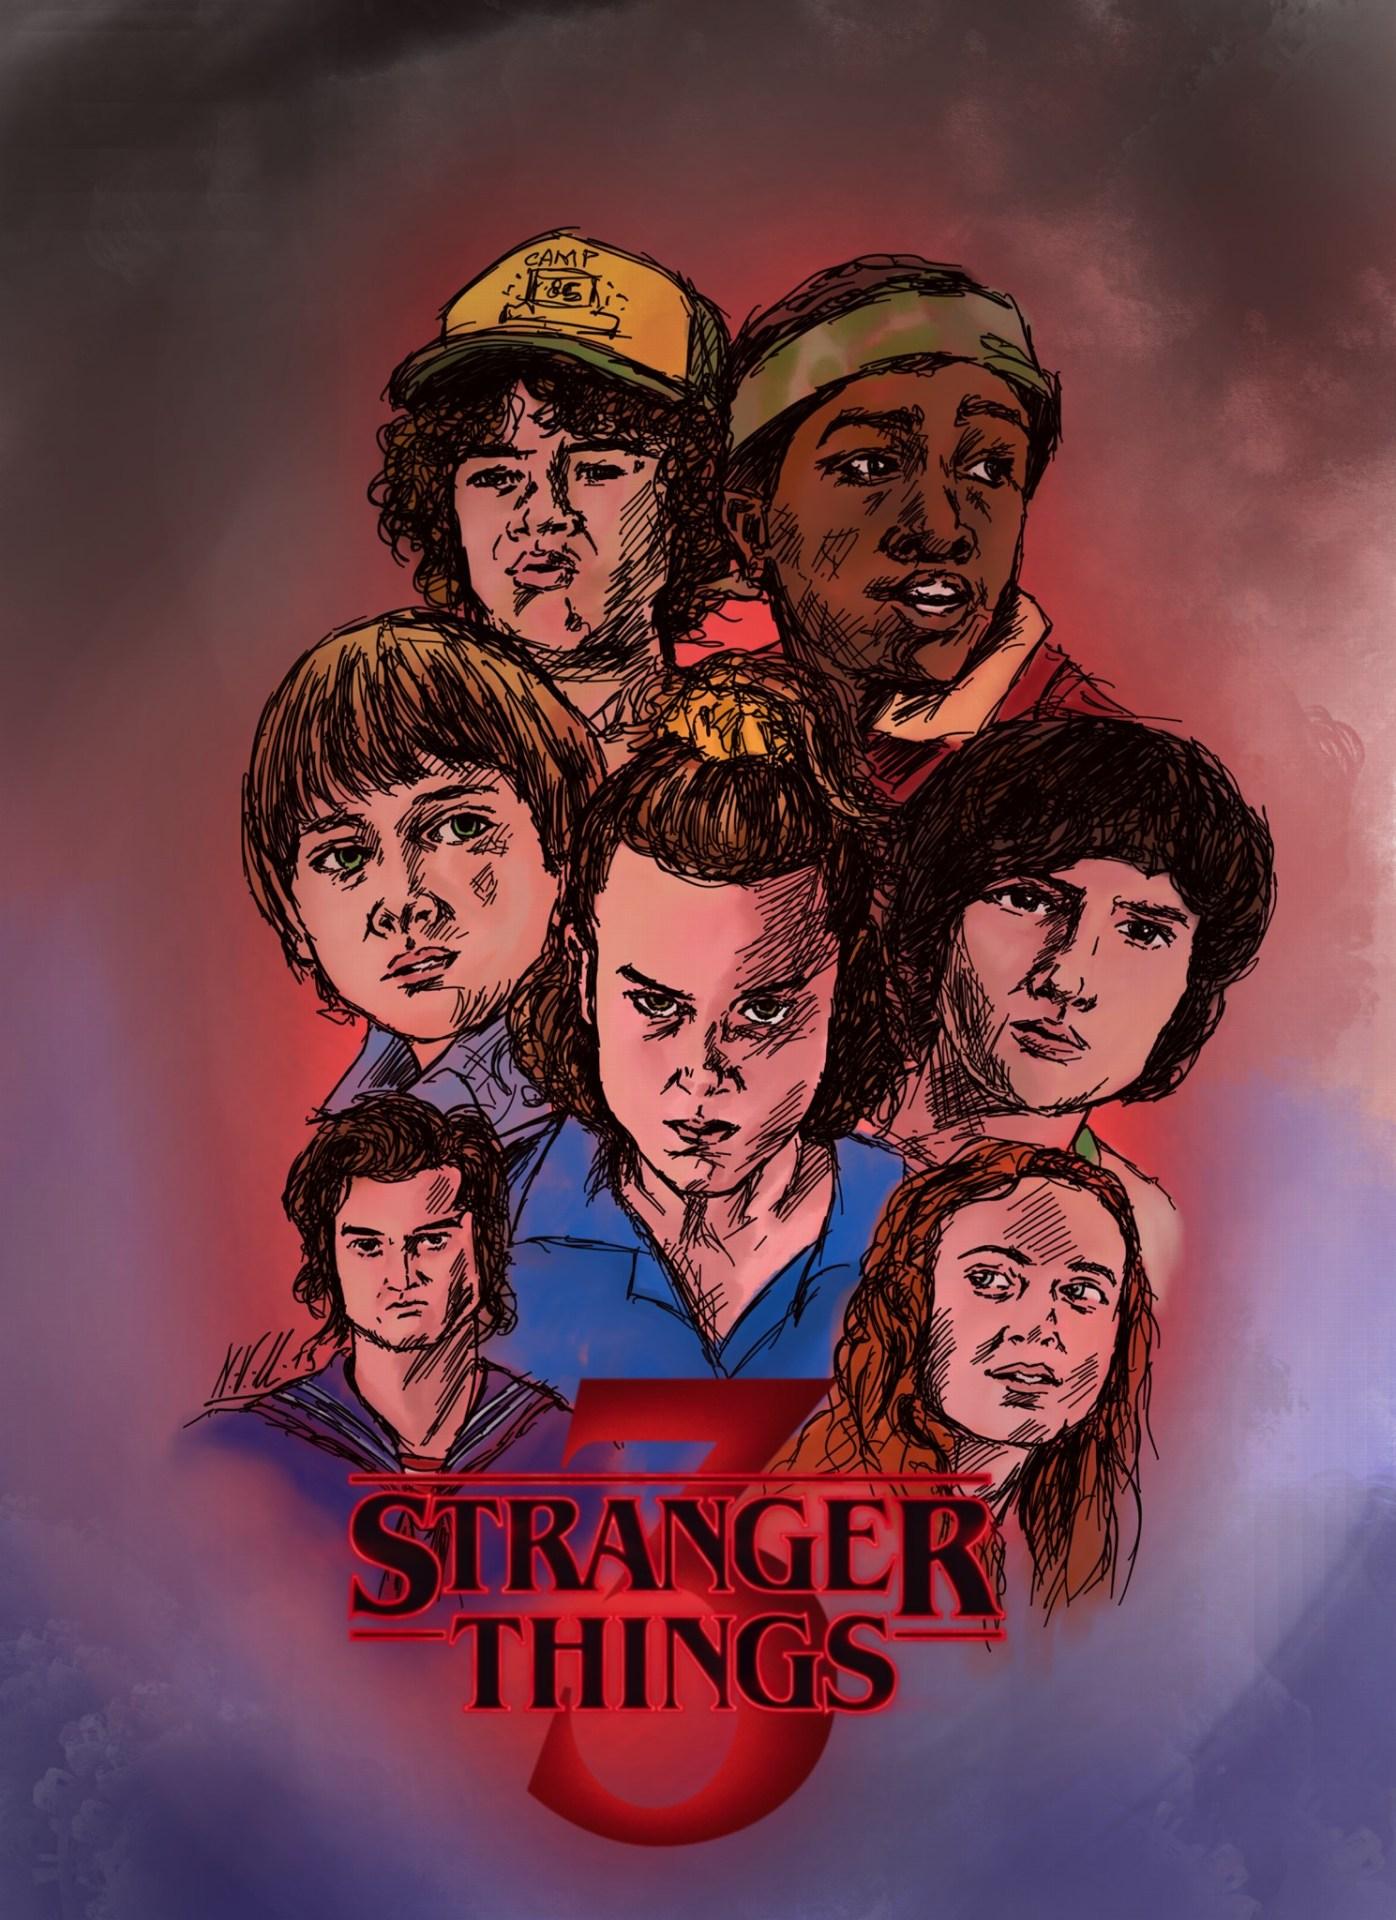 Nicolò Villani - Stranger Things 3 (2019)